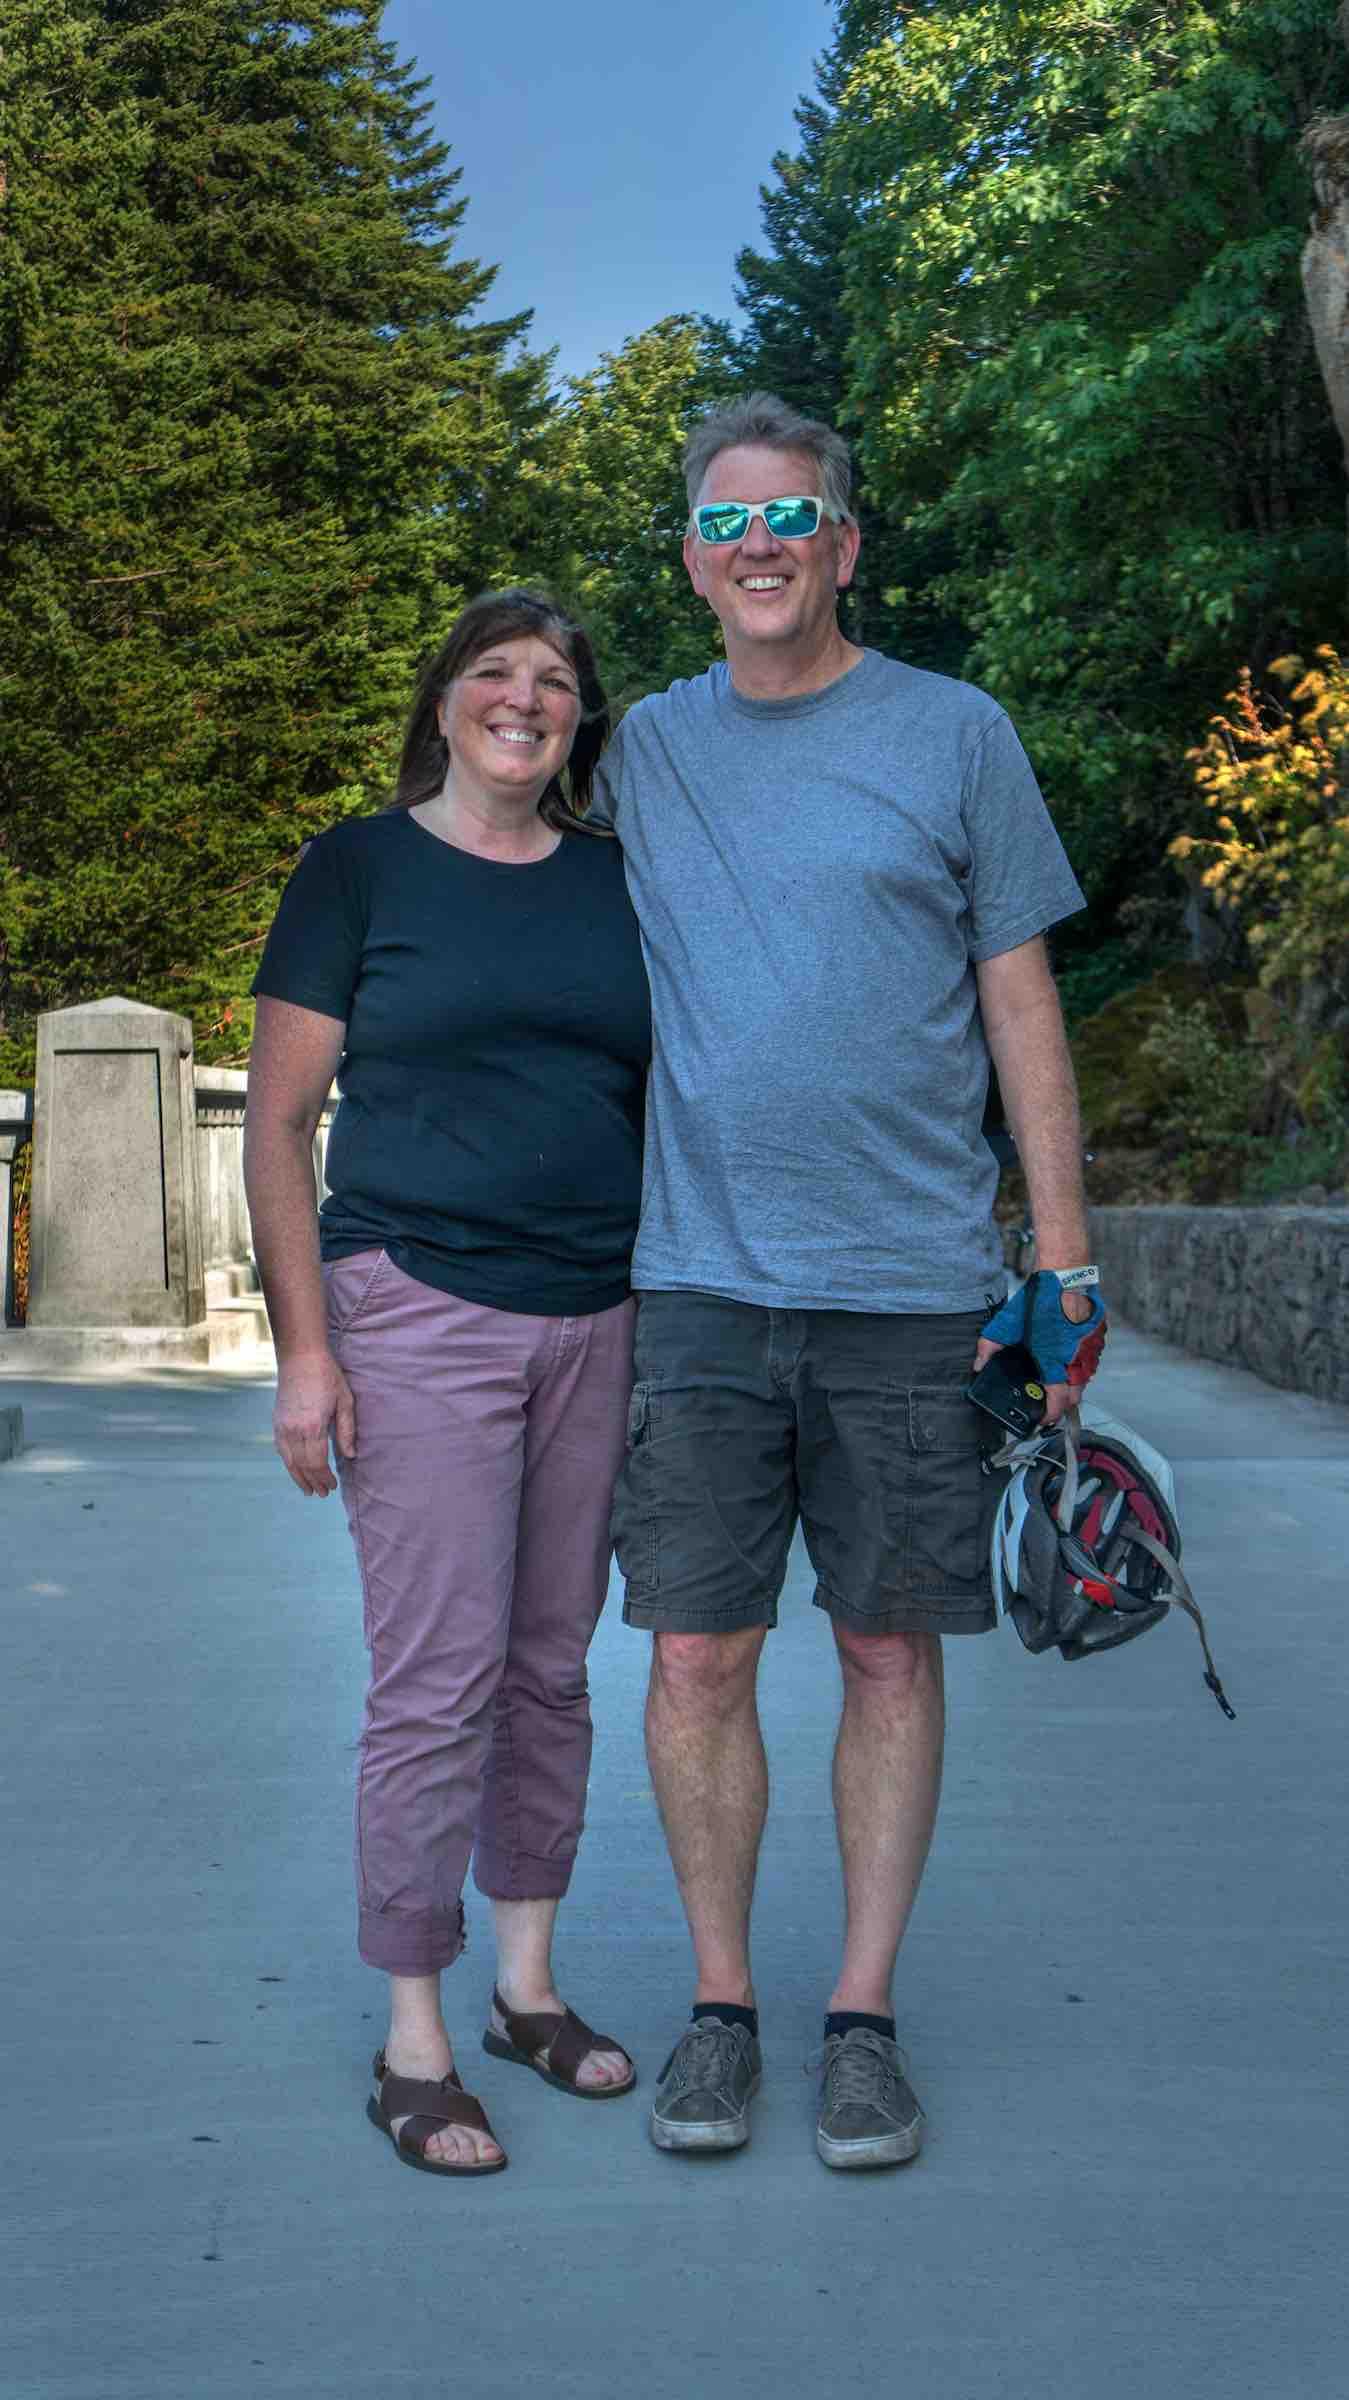 Suzi and me on the trail. (Credit: Jamison Logan)